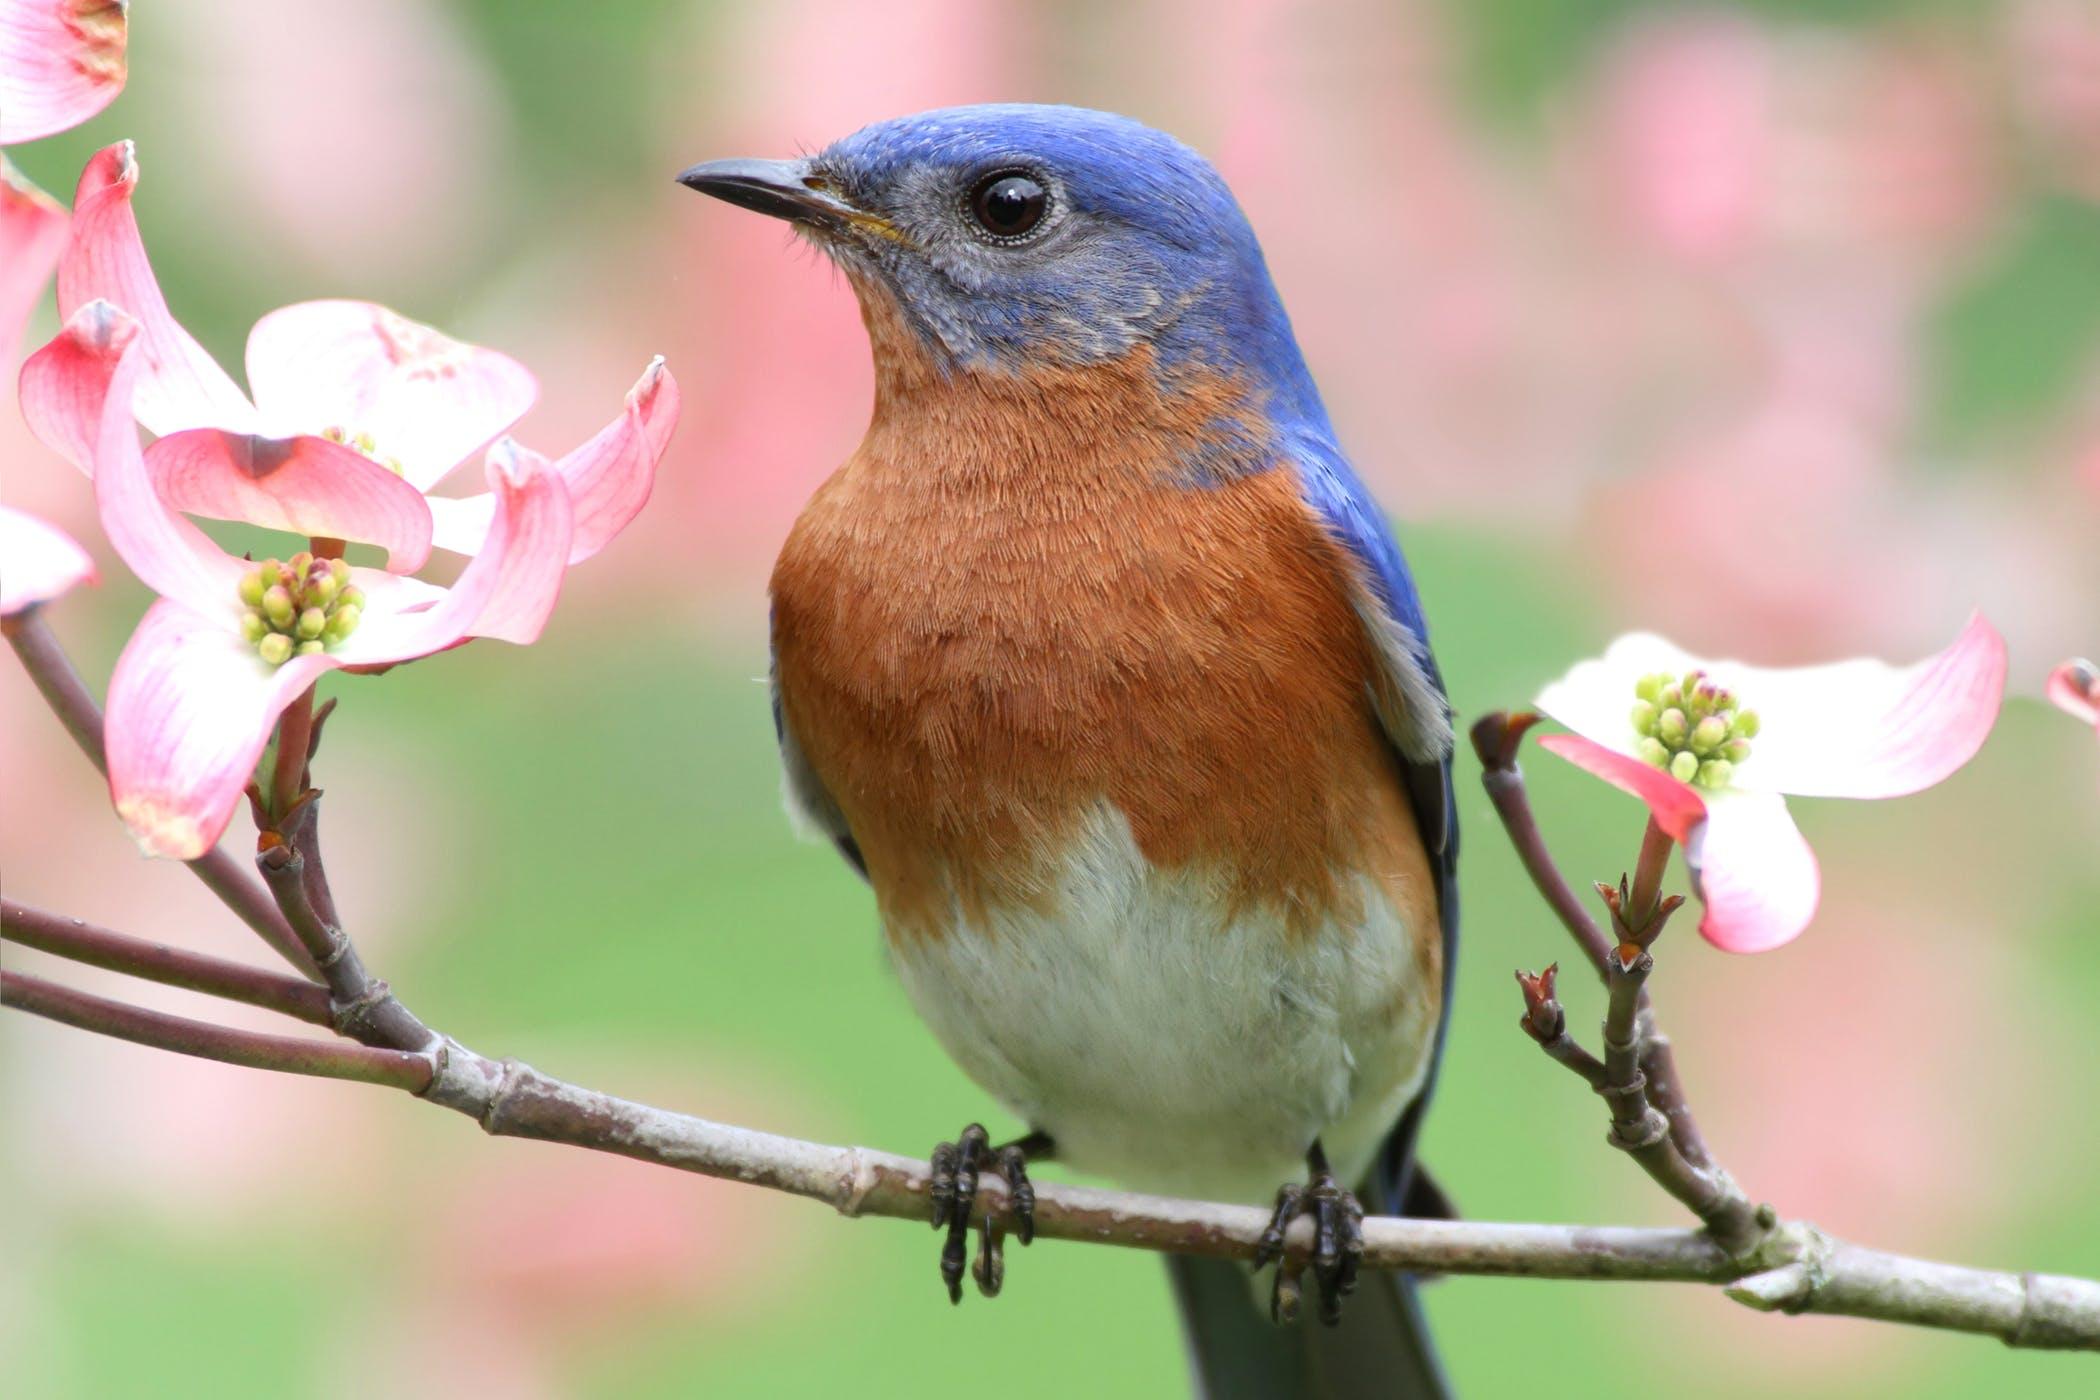 Polytetrafluoroethylene Toxicosis in Birds